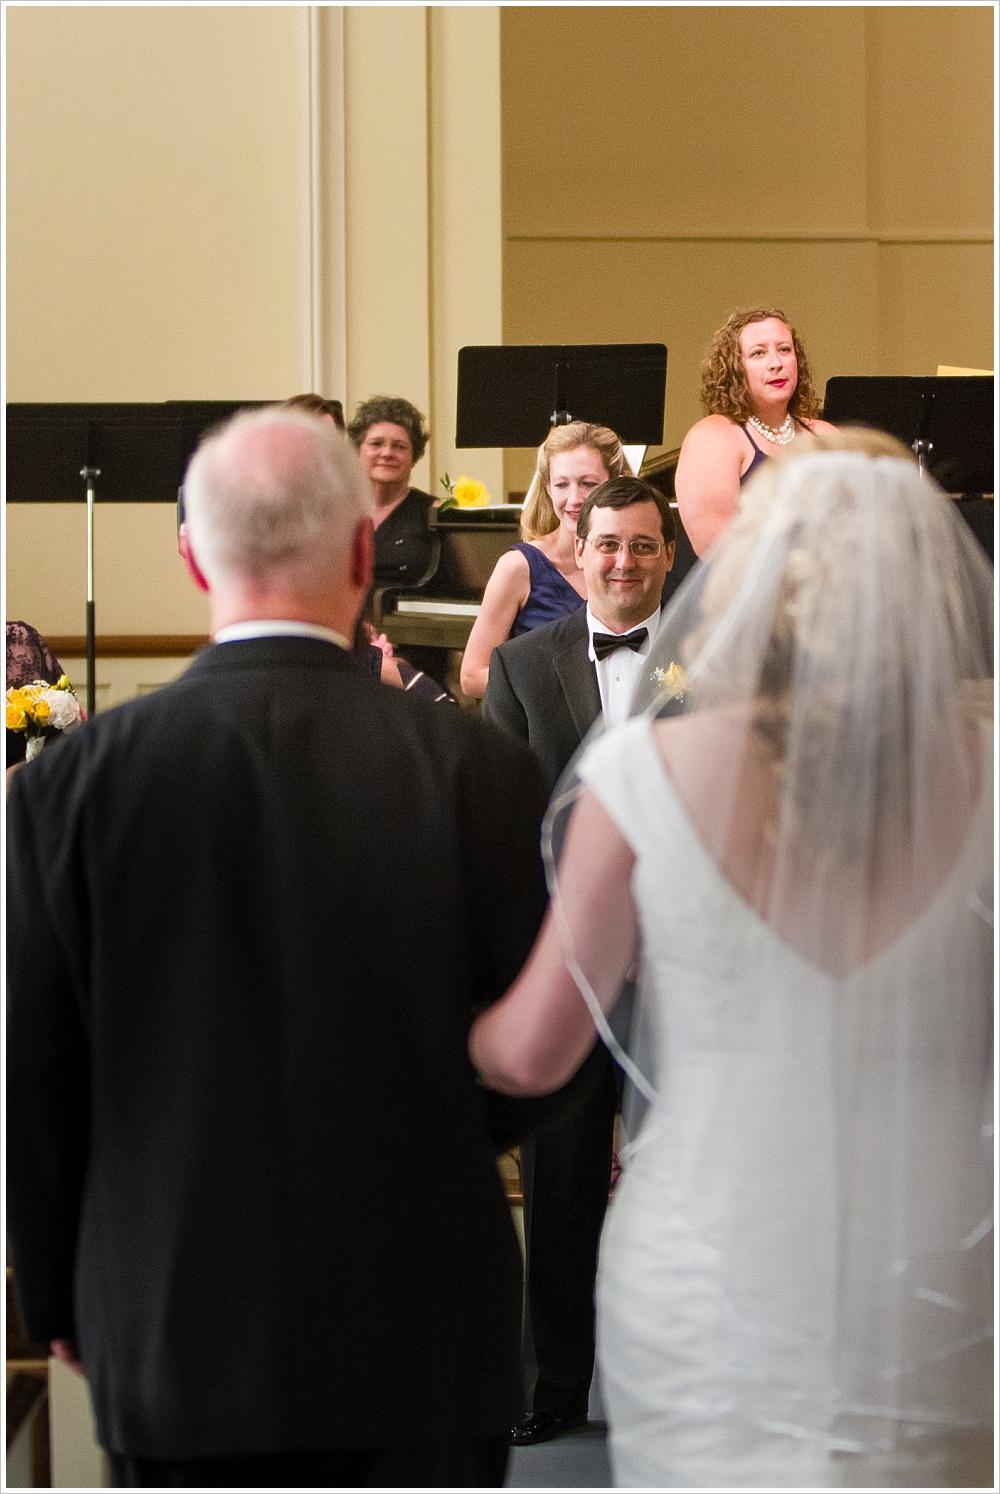 groom over bride's shoulder as she comes down the aisle | Calvary Baptist Church, Waco, TX | Jason & Melaina Photography